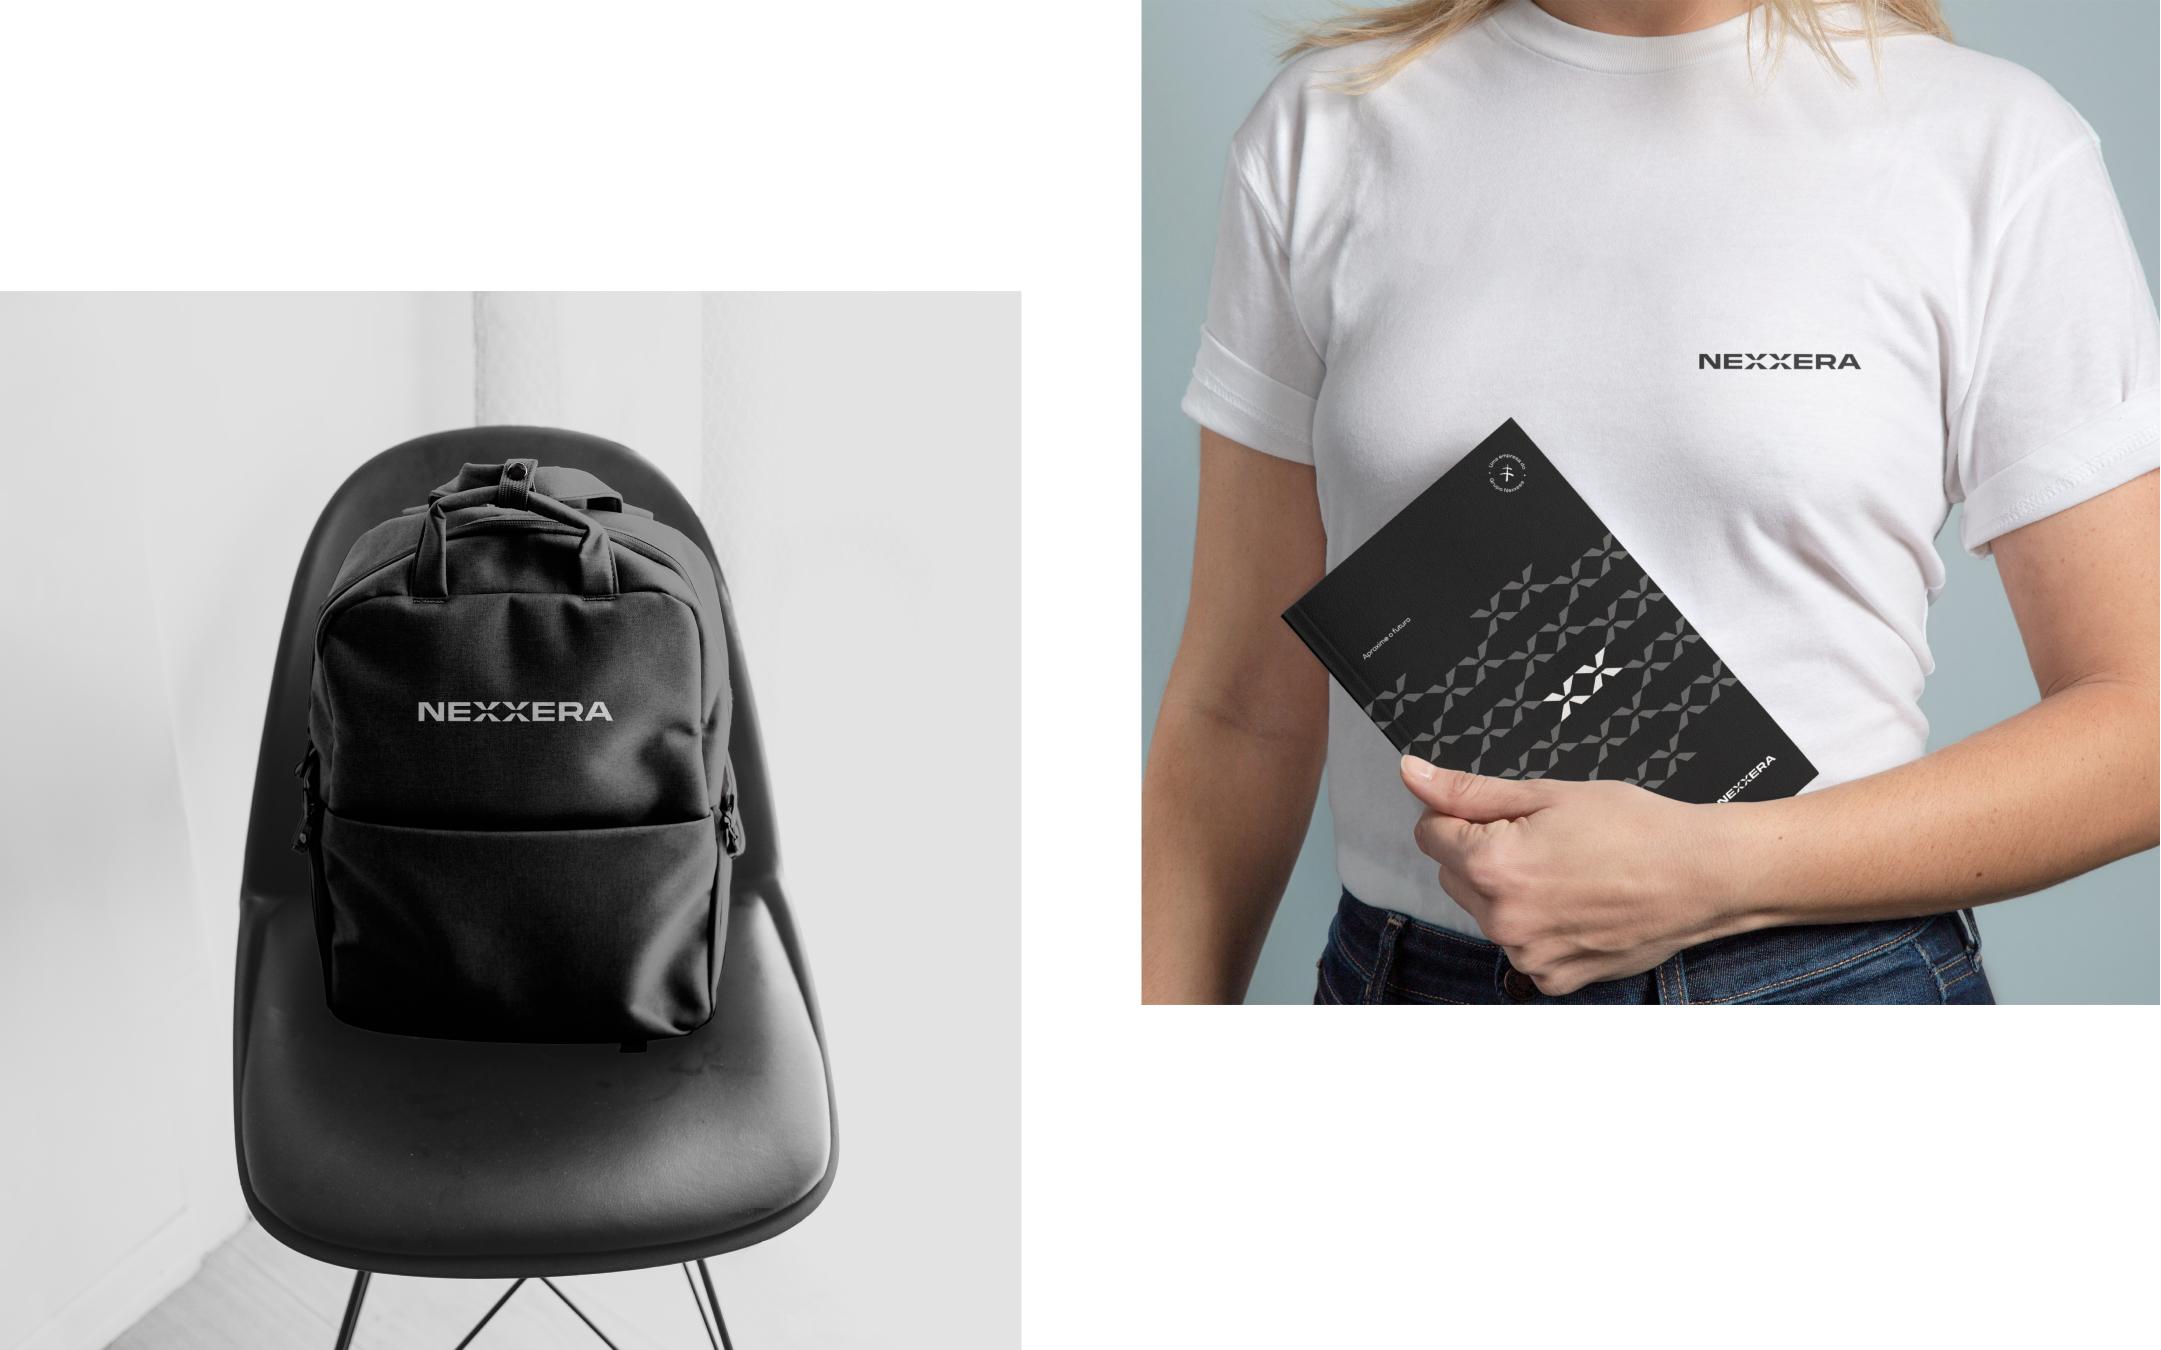 Nexxera-Branding-Rebrand-Design-2-1